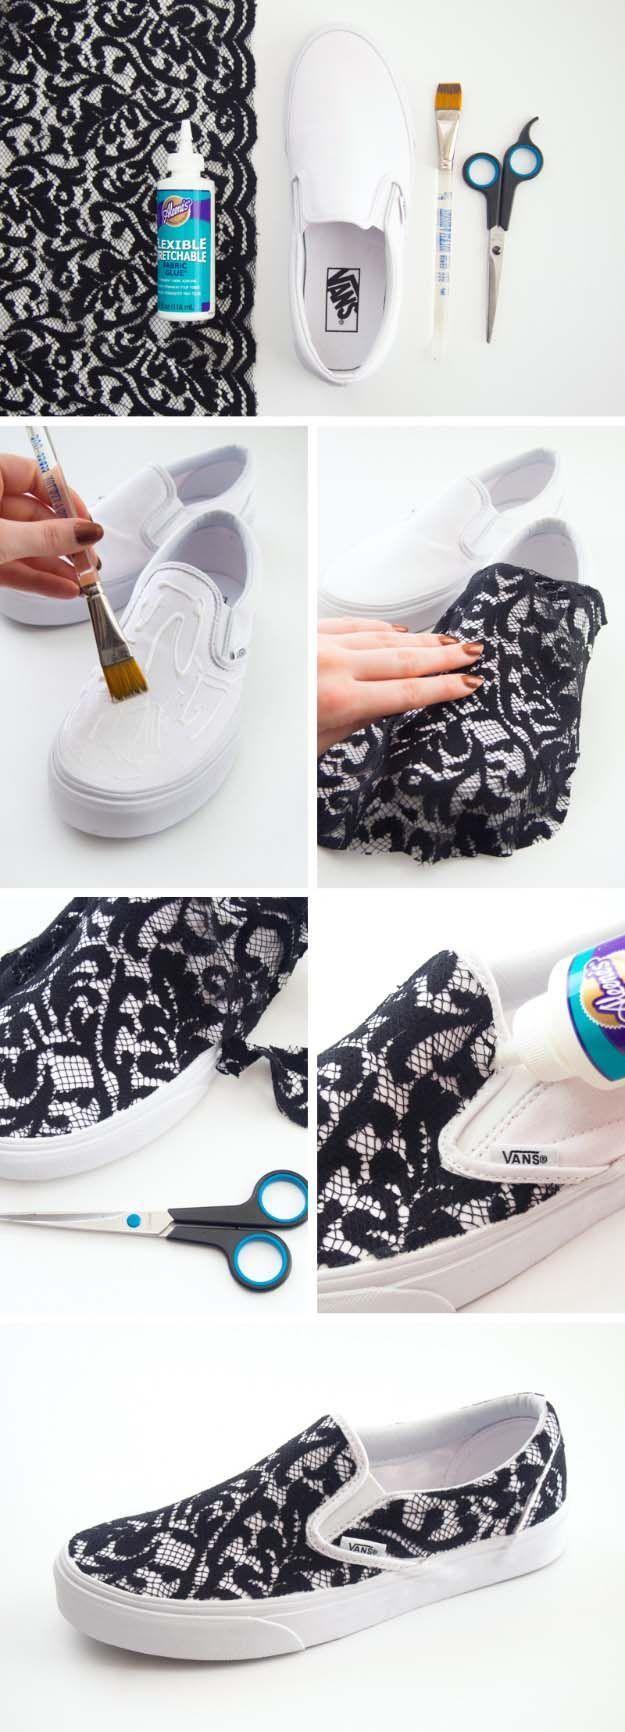 Cool diy fashion ideas sewing jeans fashion project and lace slip cool diy fashion ideas solutioingenieria Choice Image